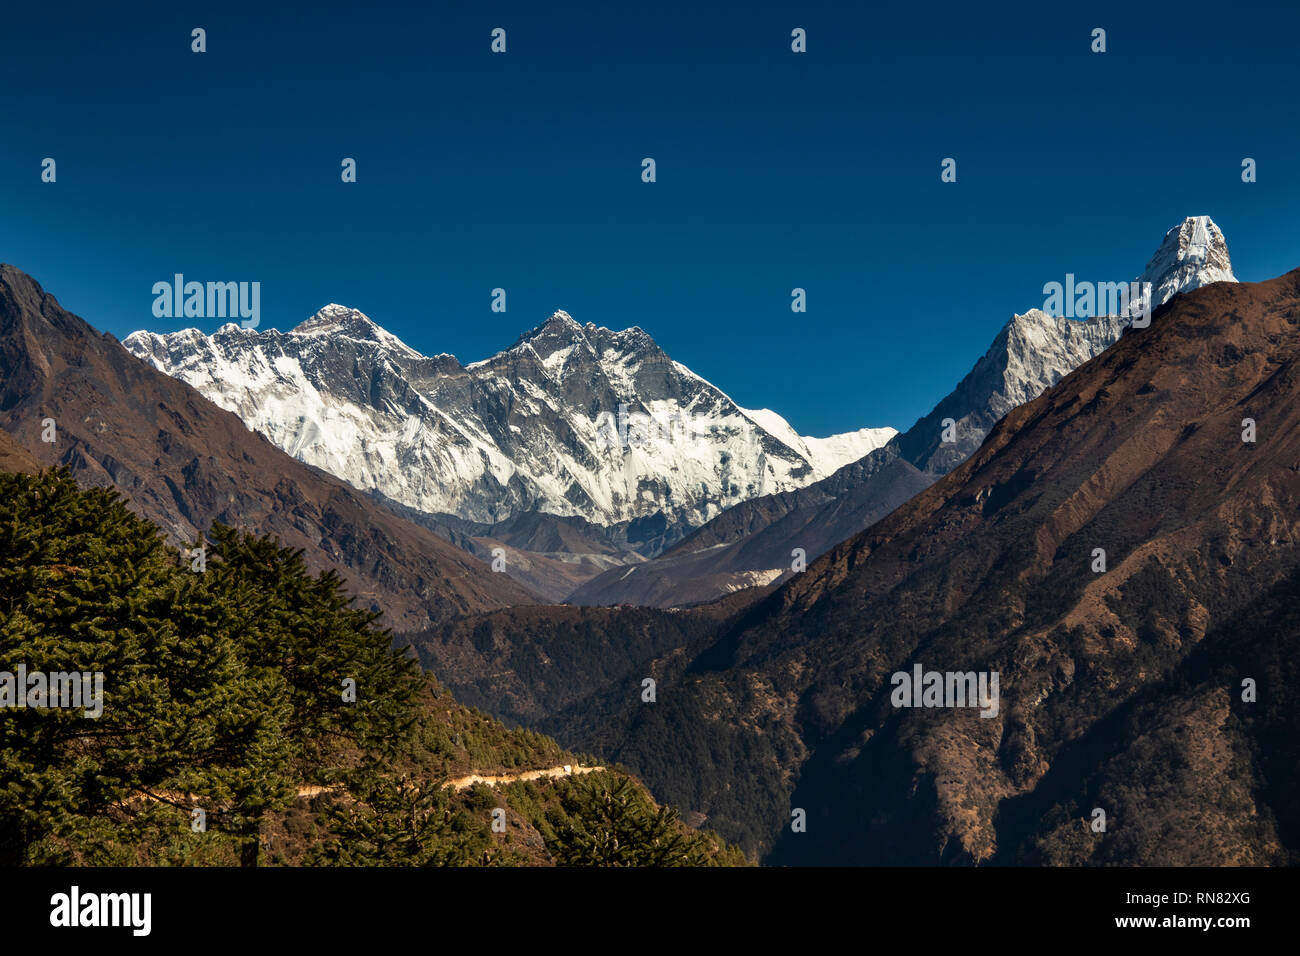 Nepal, Namche Bazaar, Sagarmatha National Park, Visitor Centre, panoramic view of Mount Everest, Llotse, Nuptse and Ama Dablam - Stock Image